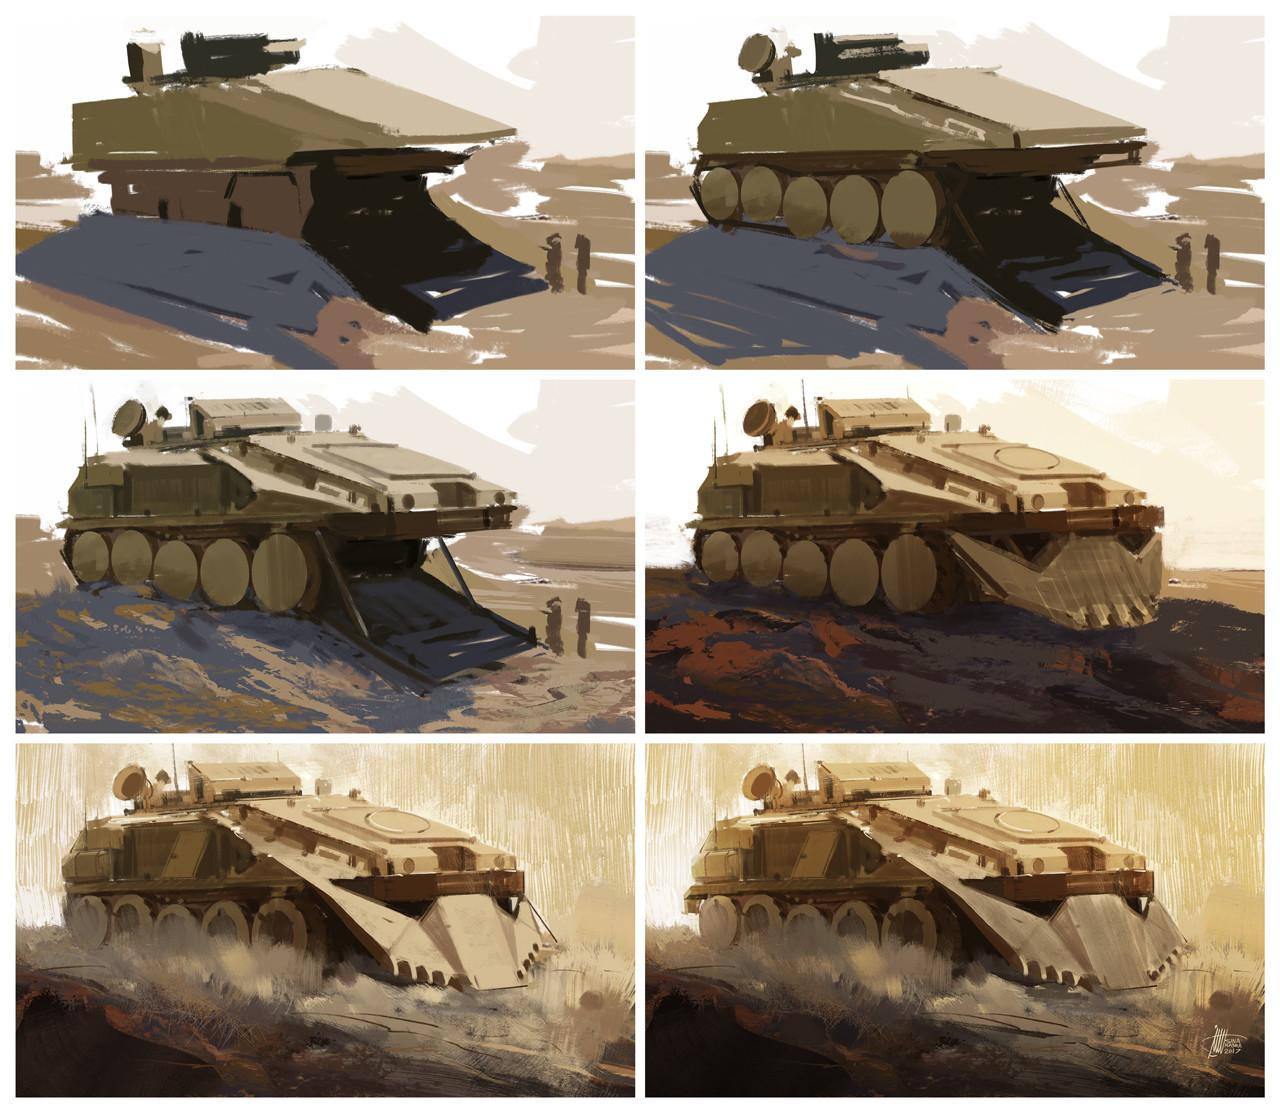 Sina pakzx kasra armoured personnel carrier steps